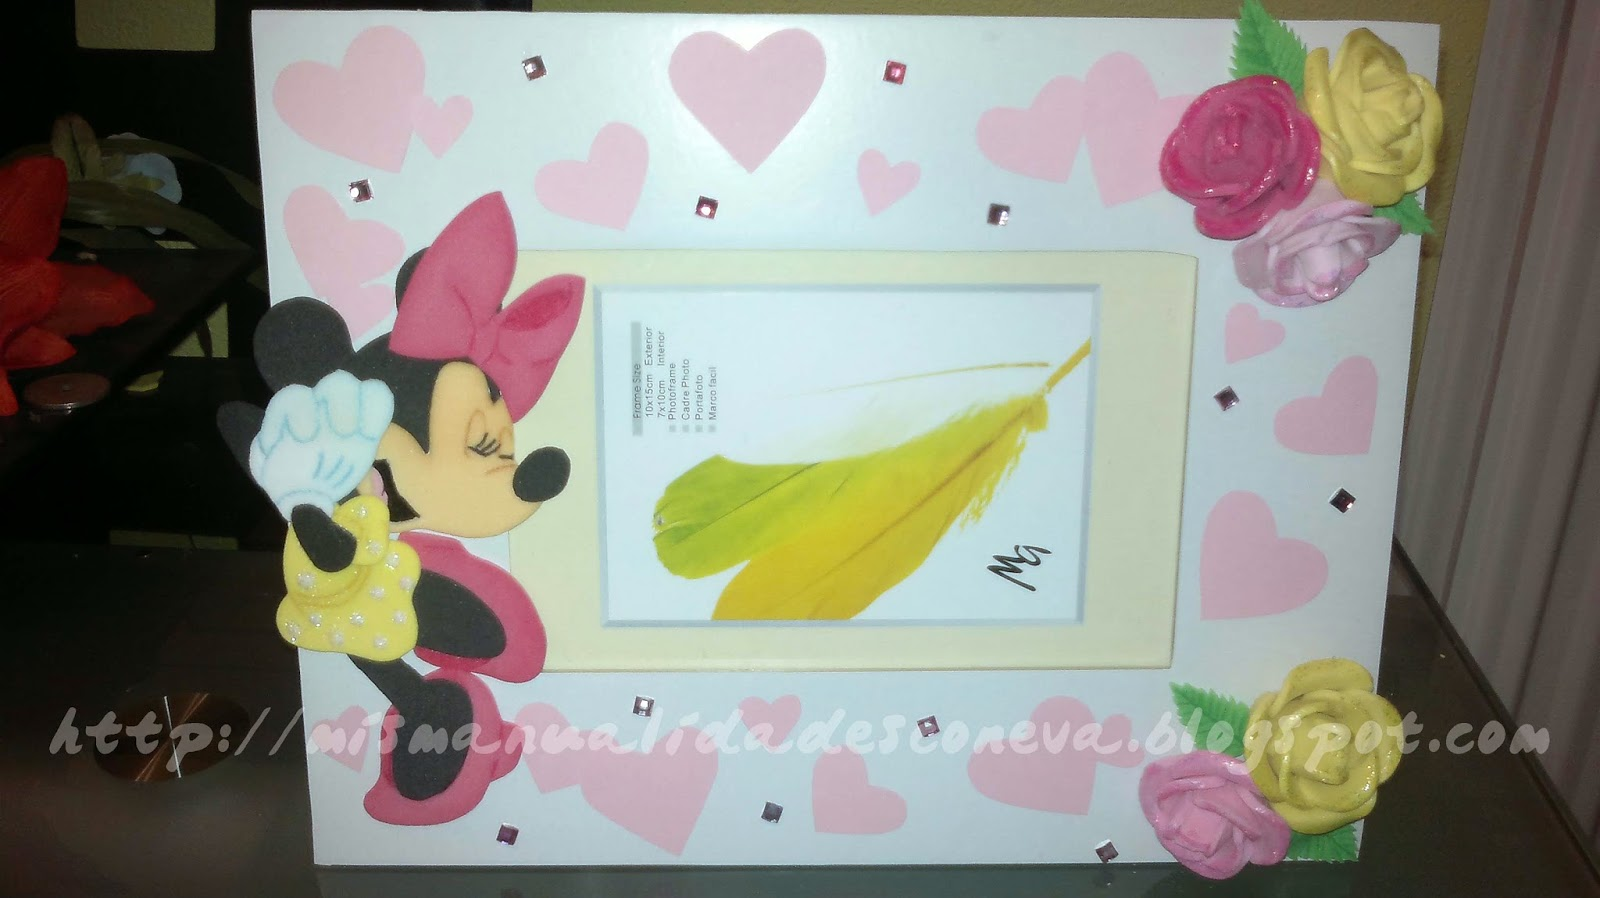 Mis manualidades con eva marco de fotos minnie mouse - Marcos fotos manualidades ...